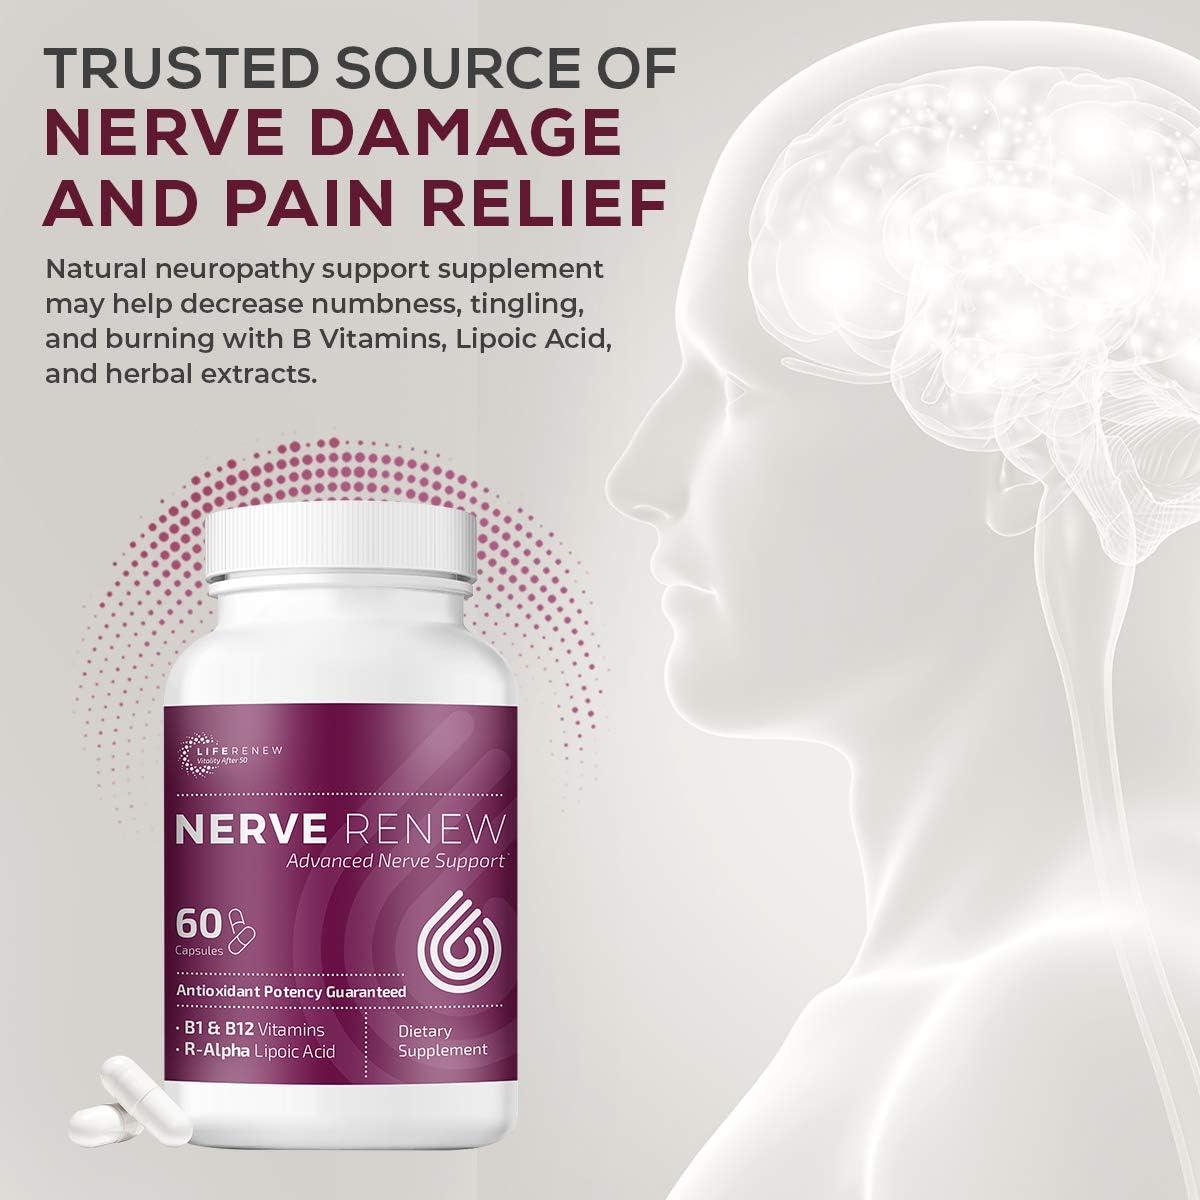 Amazon.com: Life Renew: Nerve Renew Advanced Nerve Support - Alternative  Nerve Pain Relief with Alpha Lipoic Acid and Vitamin B Complex - 60  Capsules - Antioxidants: Health amp; Personal Care